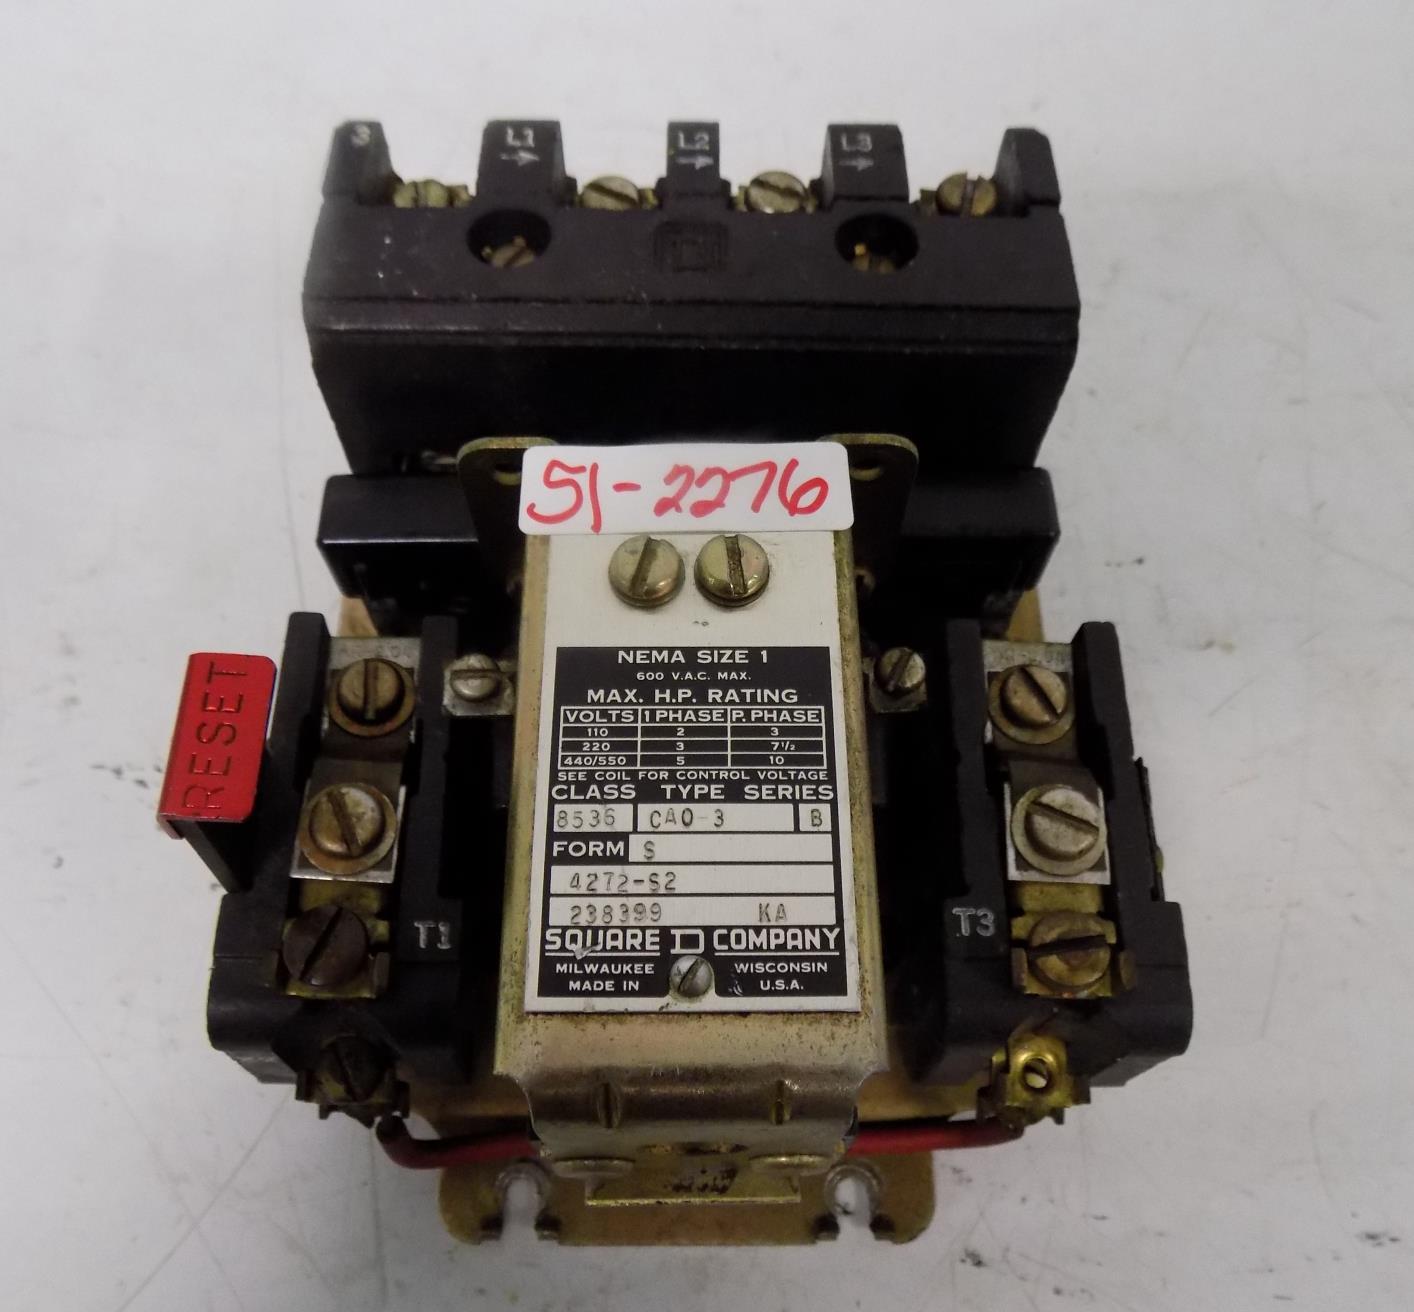 Square D 600v Nema Size 1 Motor Starter Class 8536 Type